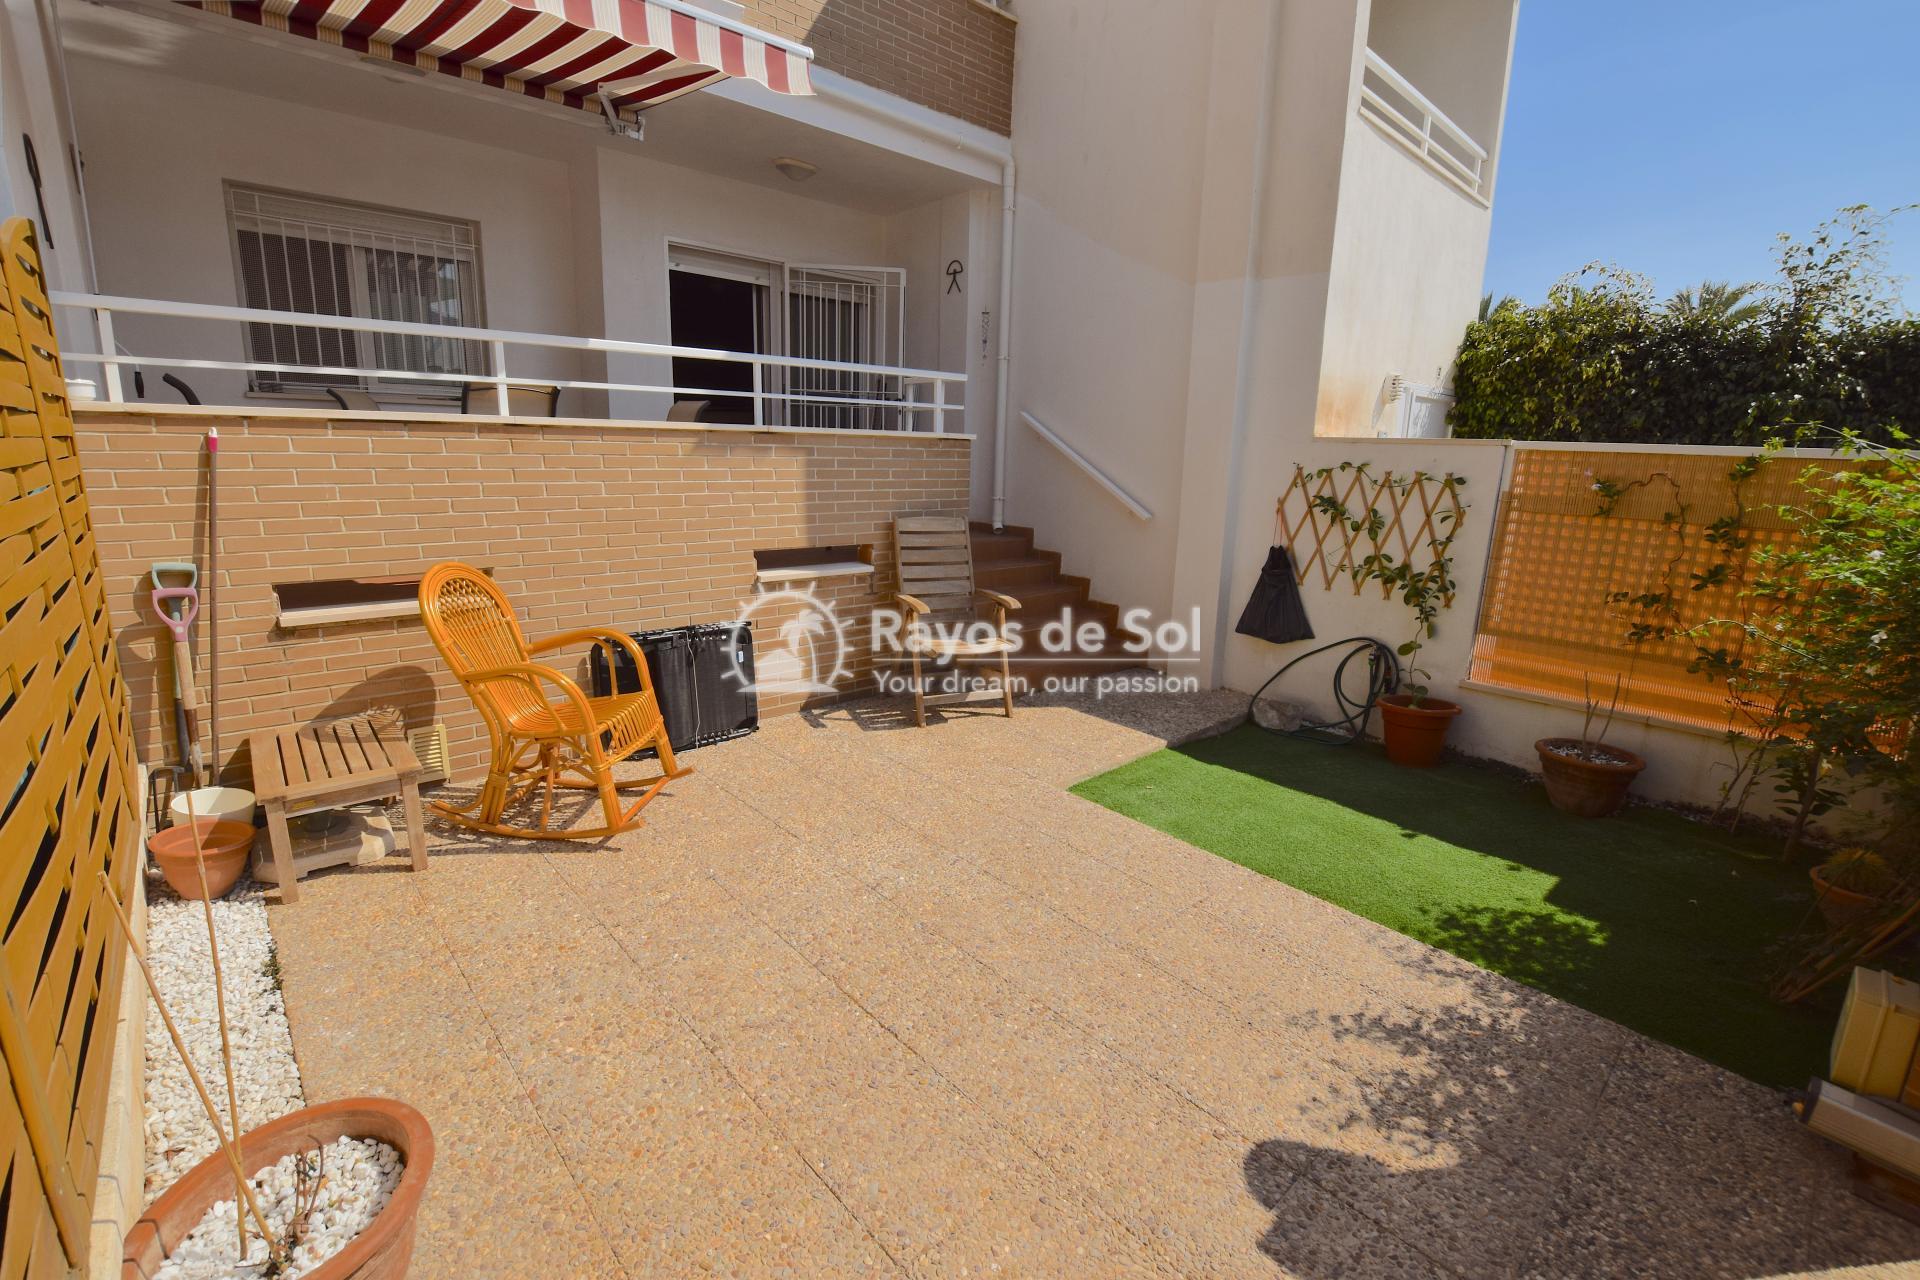 Appartement met zuidwest oriëntatie  in San Cayetano, Costa Cálida (SCRE0055) - 24